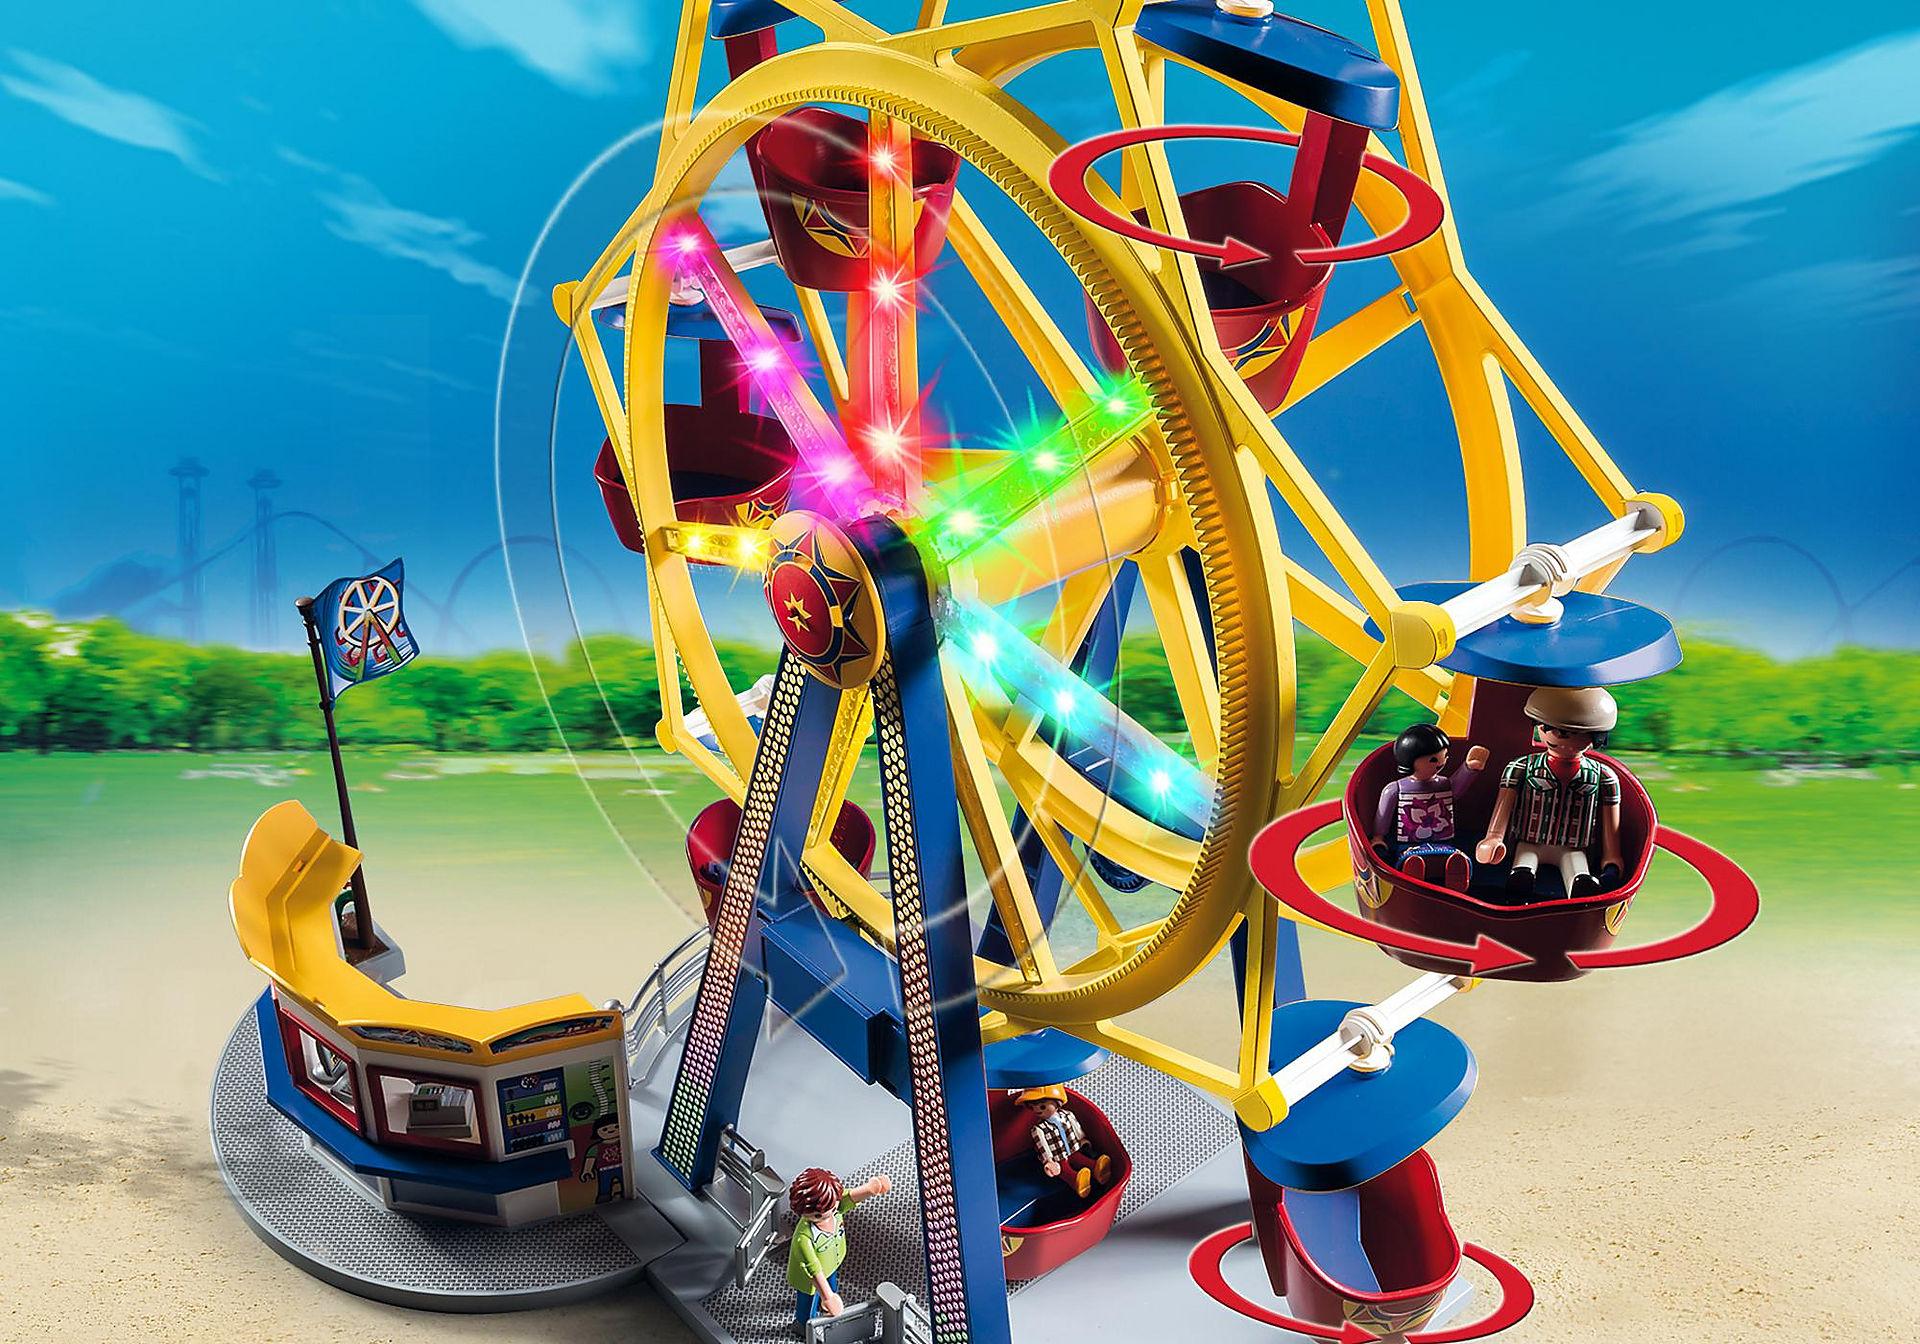 http://media.playmobil.com/i/playmobil/5552_product_extra3/Ferris Wheel with Lights